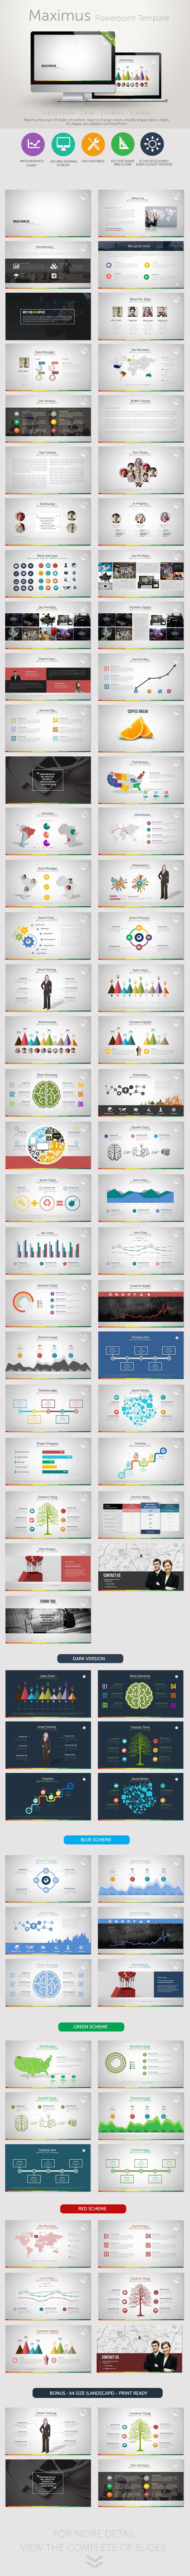 Maximus PowerPoint Presentation Template - Business PowerPoint Templates